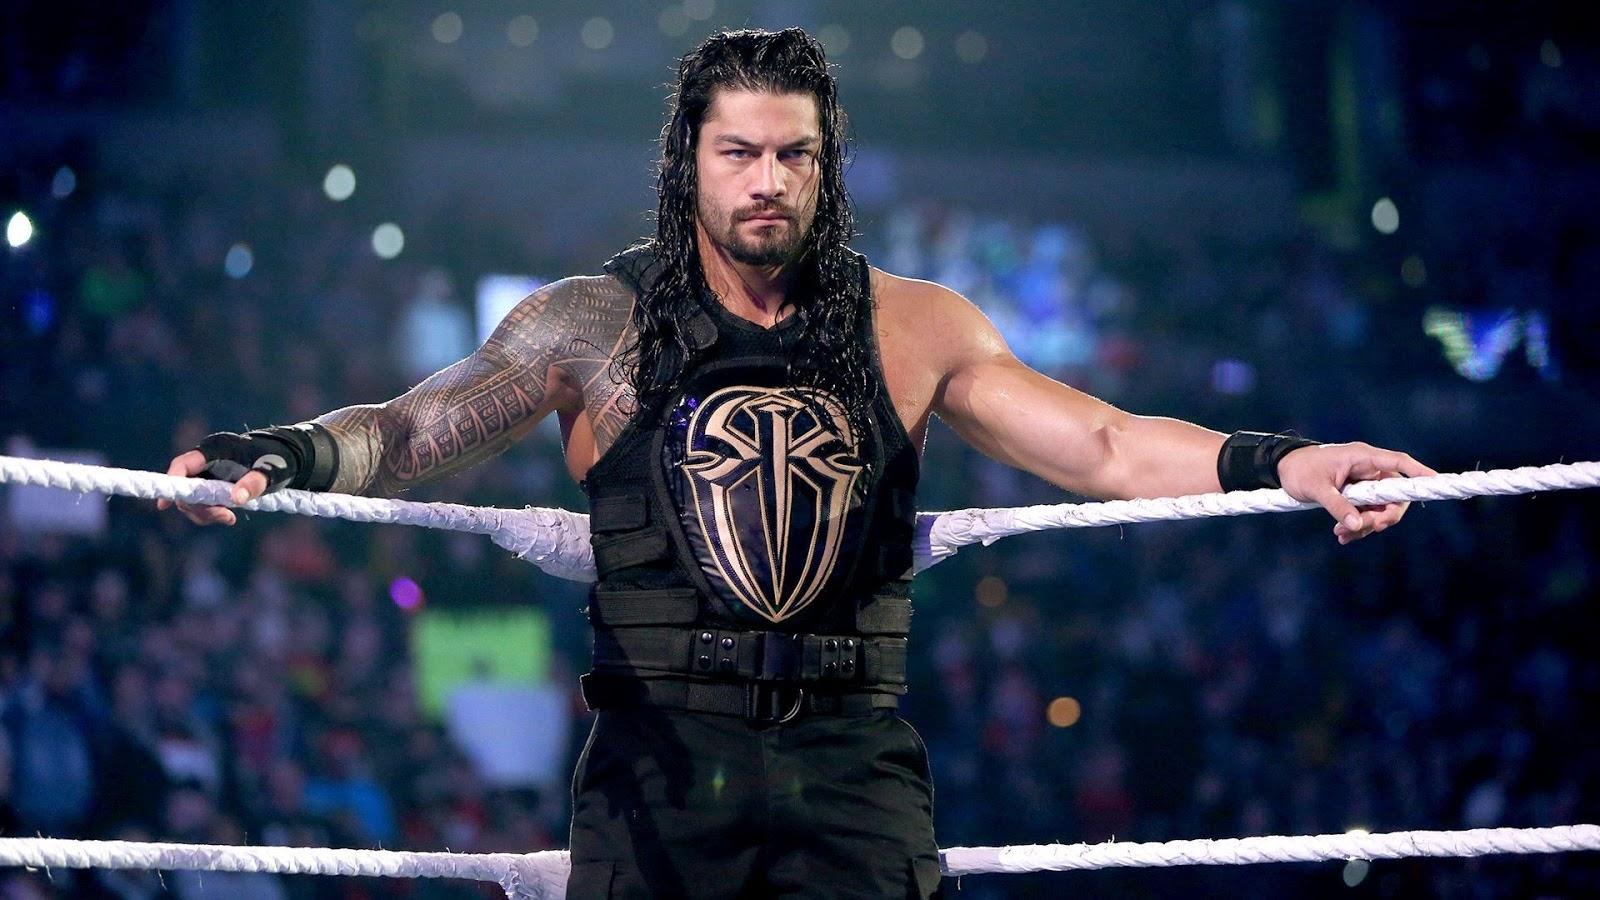 Roman Reigns Power Of Hand WWE HD Wallpaper